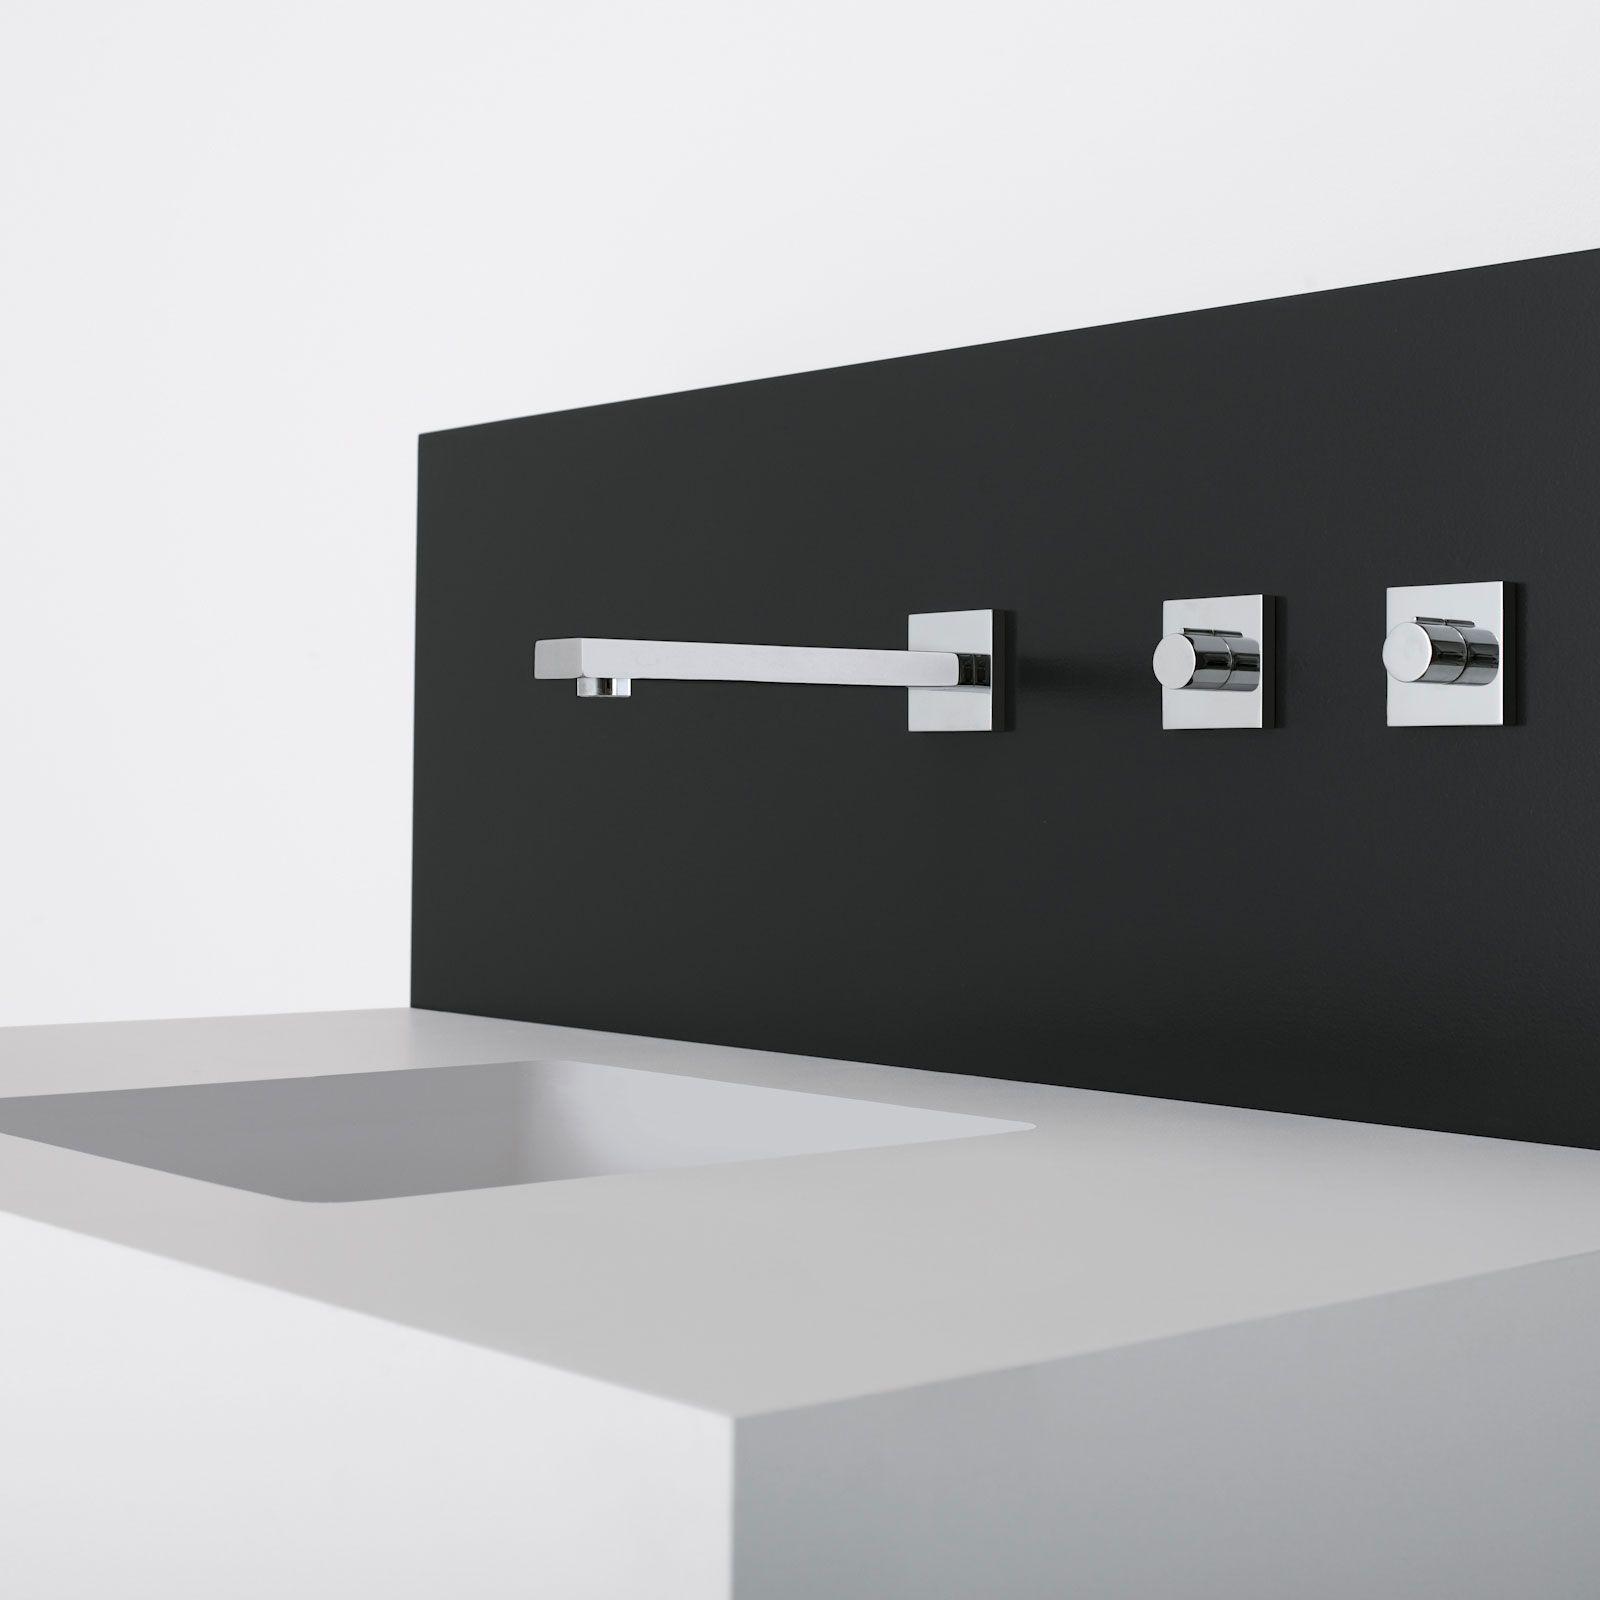 symetrics bad spa armatur dornbracht armaturen pinterest waschbecken kombination. Black Bedroom Furniture Sets. Home Design Ideas